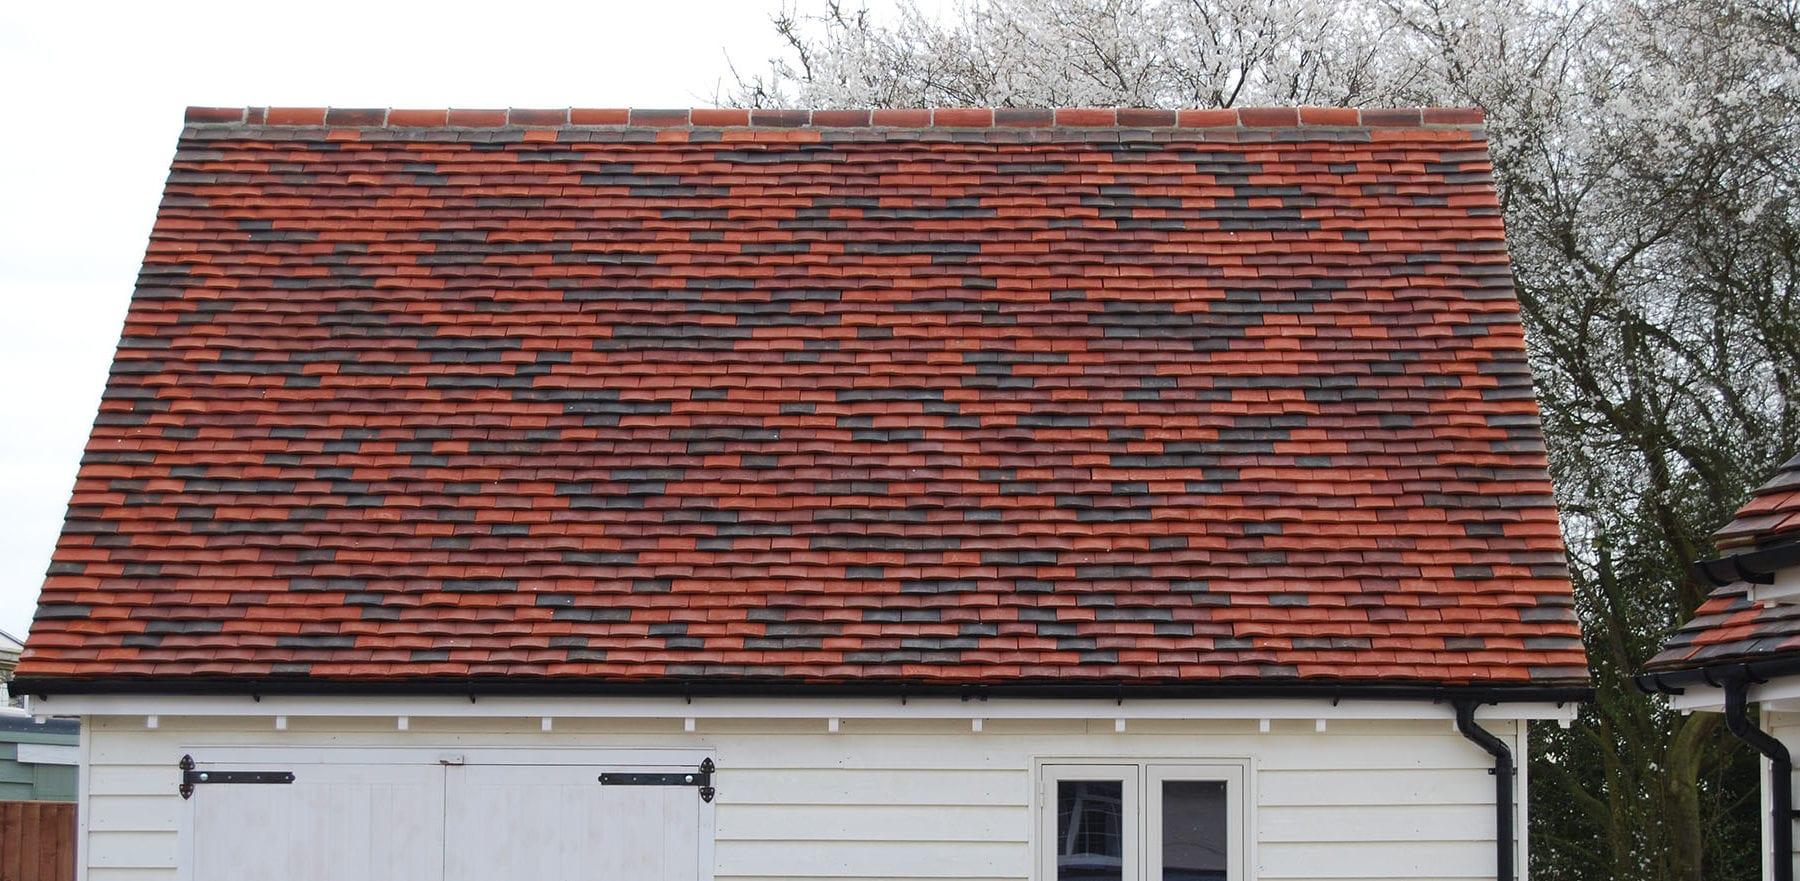 Lifestiles - Handcrafted Tilehurst Clay Roof Tiles - Cranbourne, England 3